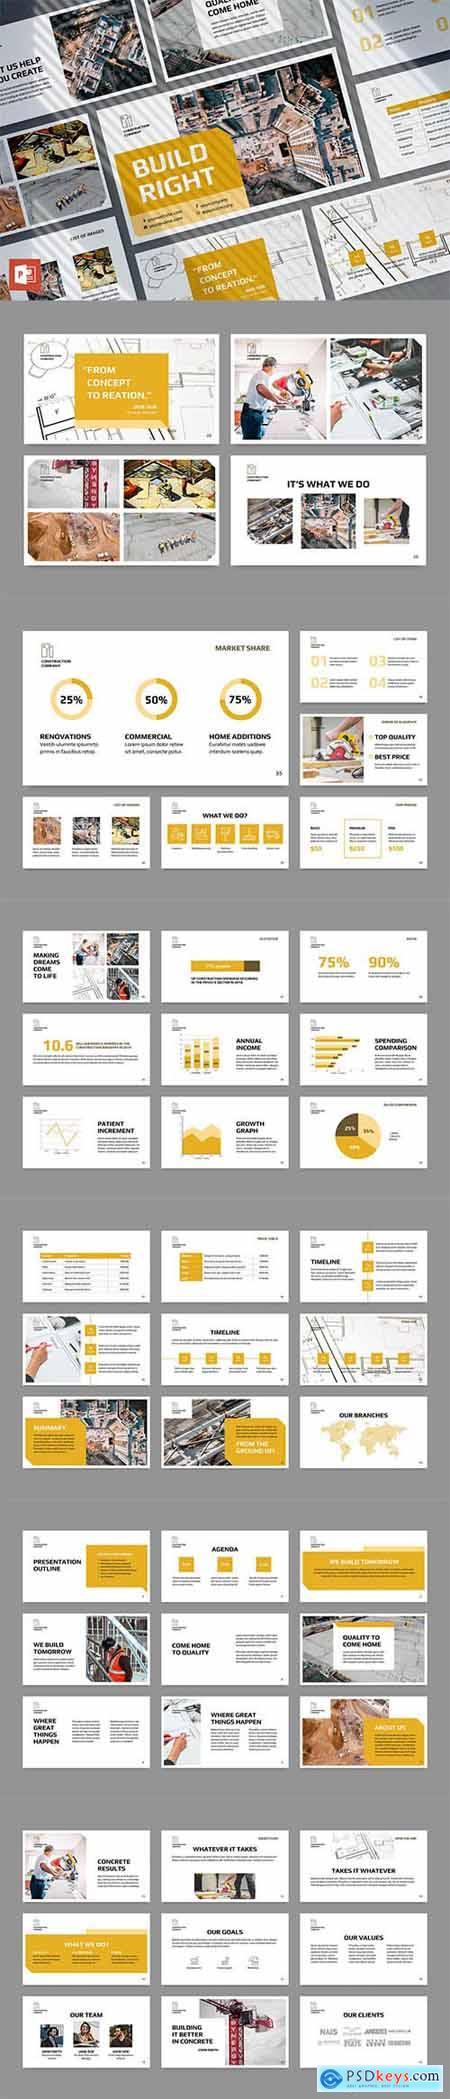 Construction Company PowerPoint Presentation